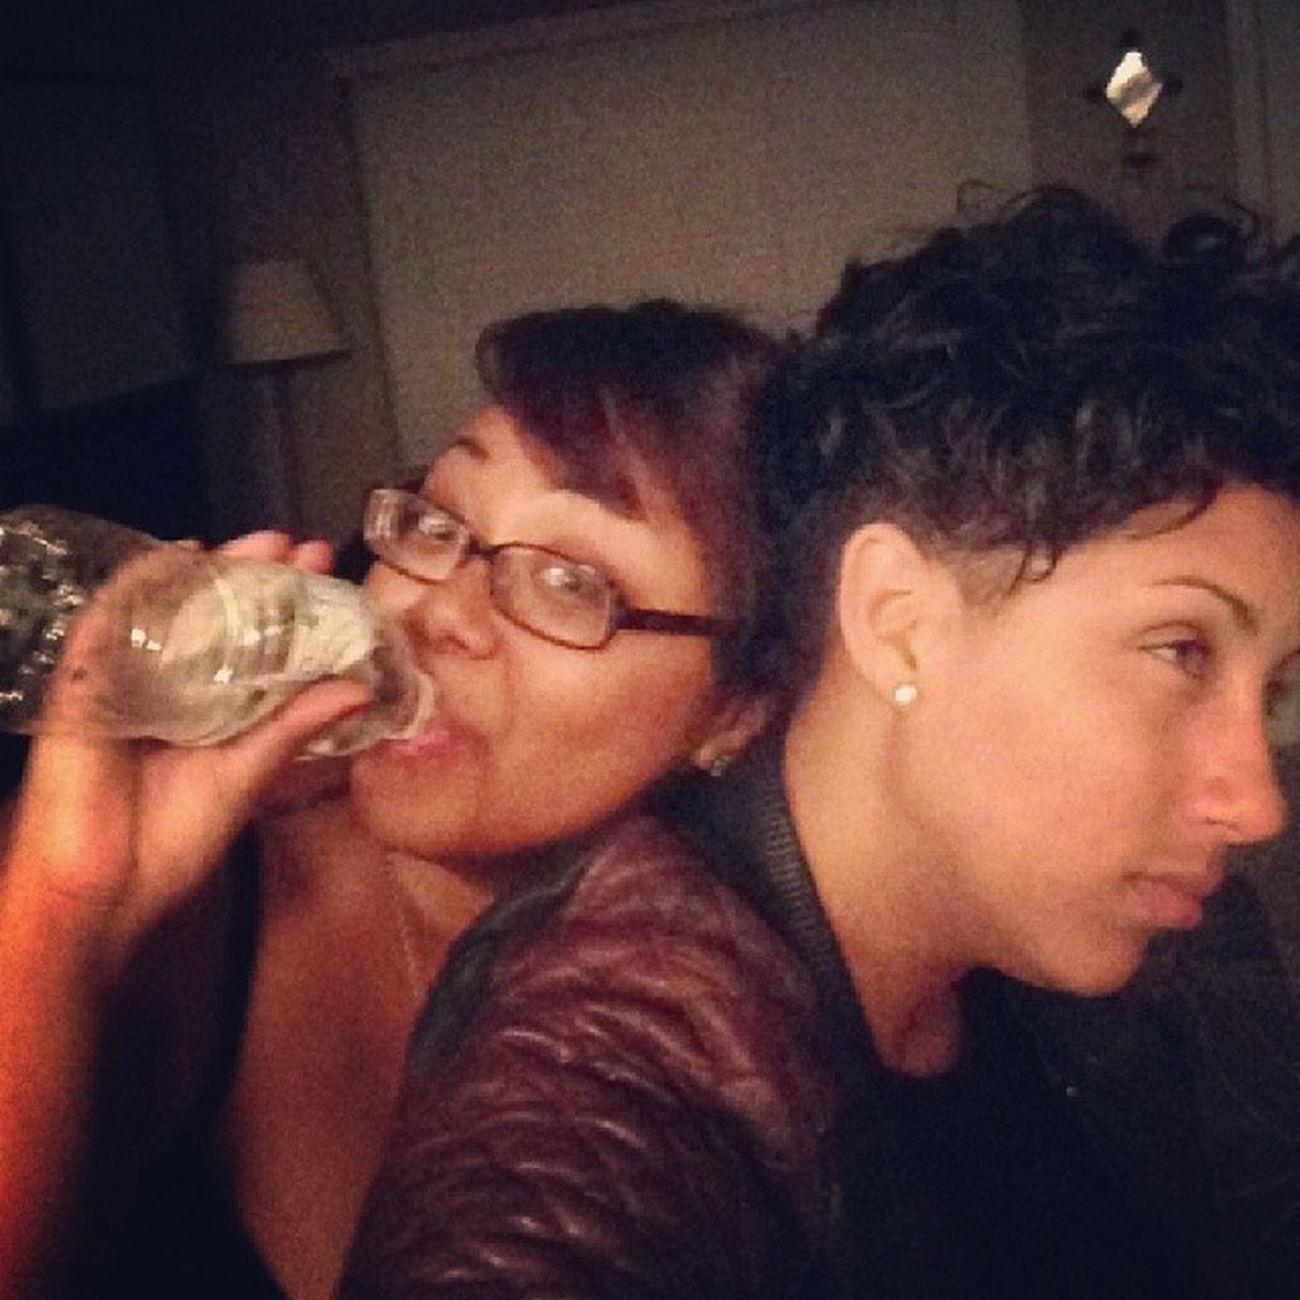 Last night's shenanigans Cousintime @megru22